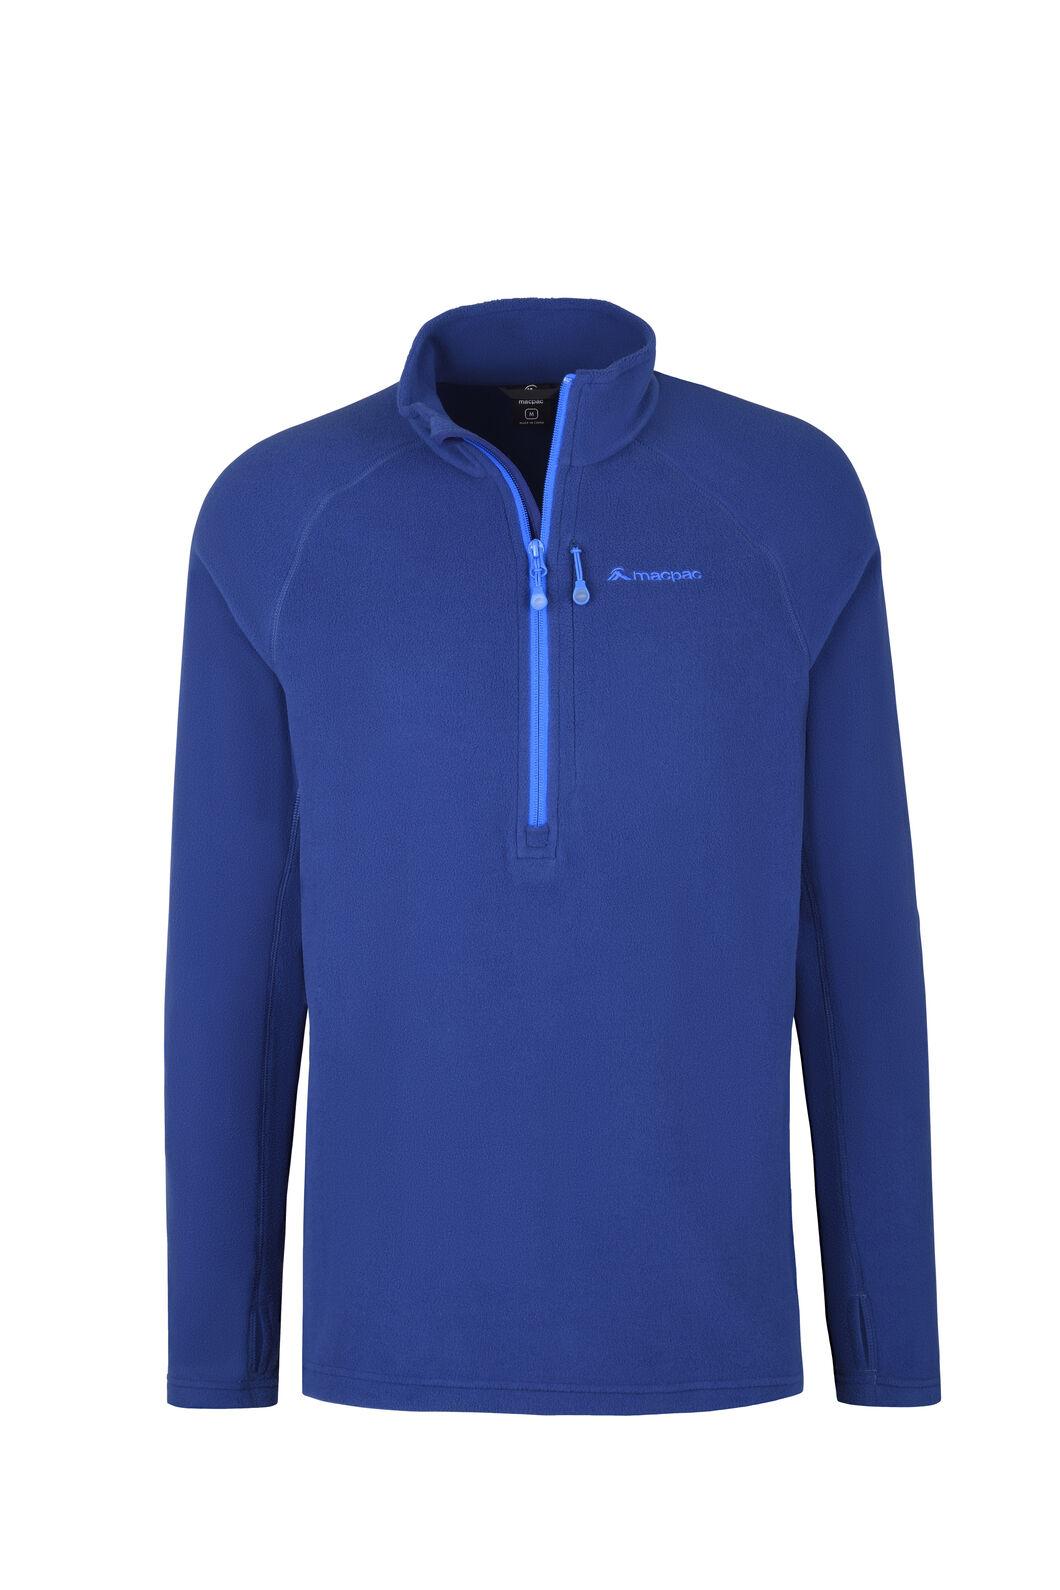 Macpac Tui Polartec® Micro Fleece® Pullover — Men's, Blue Depths, hi-res